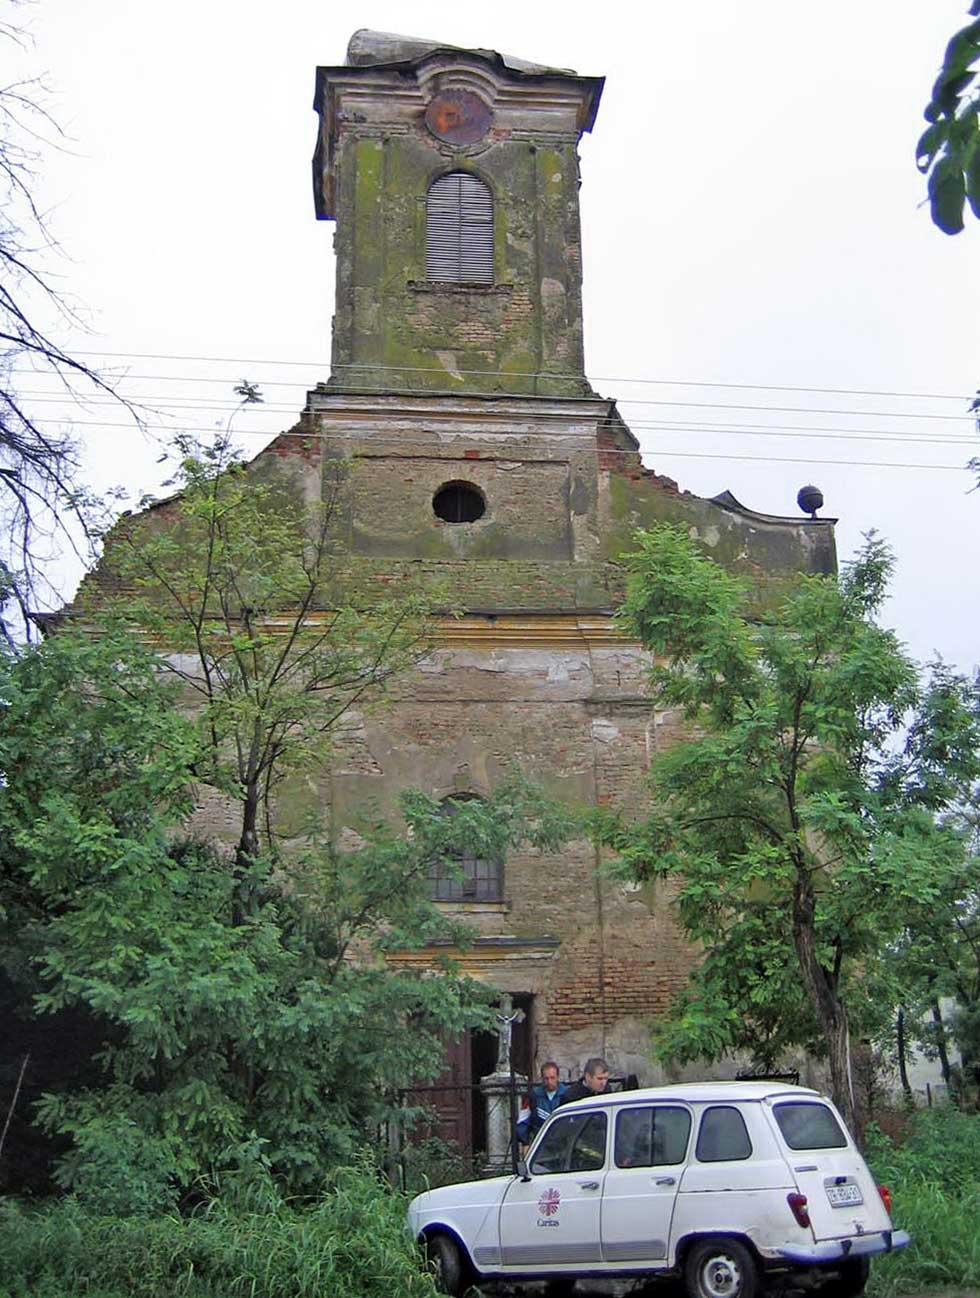 crkva u selu međa